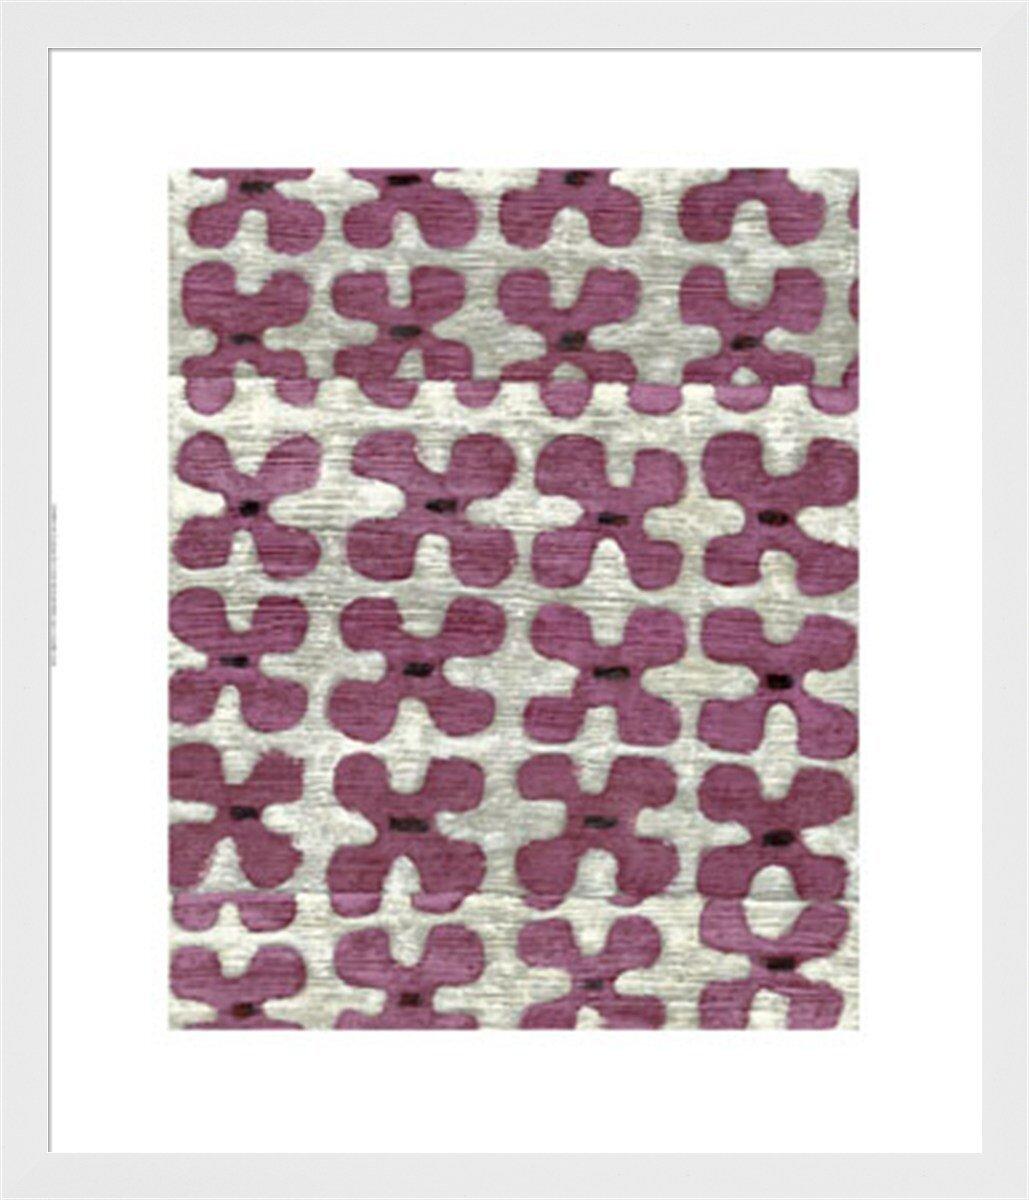 Geometric Evive Designs Framed Art You Ll Love In 2021 Wayfair